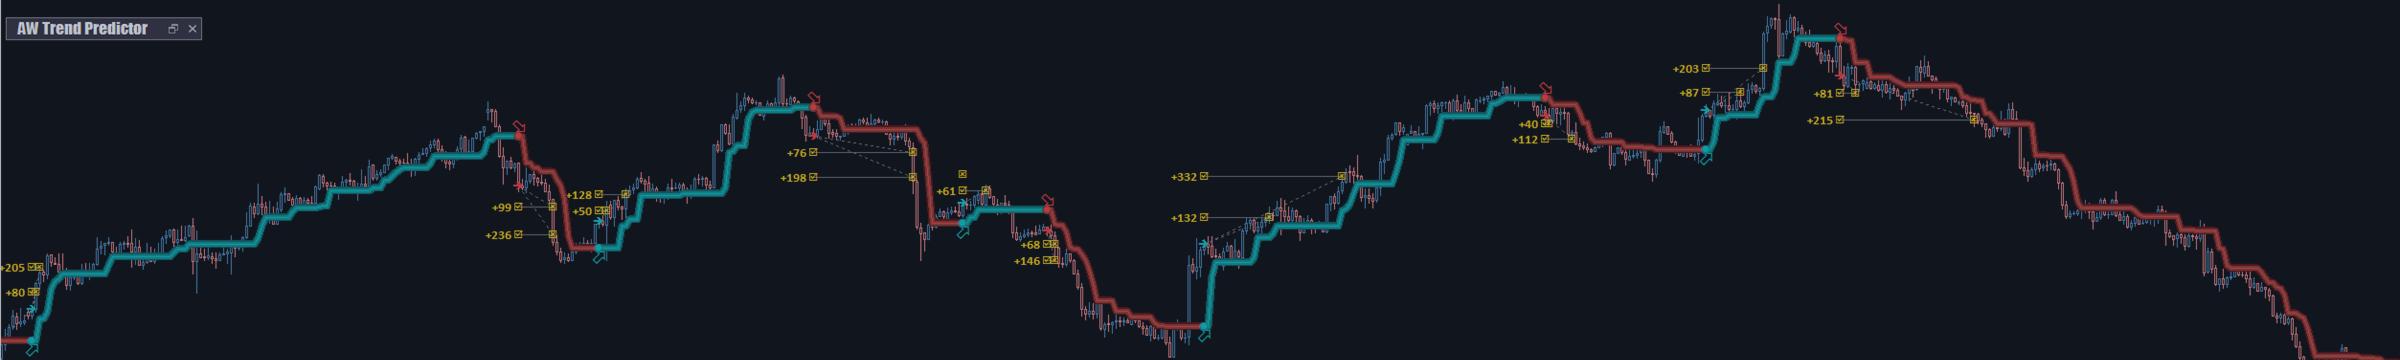 AW Trend Predictor Инструкция к индикатору